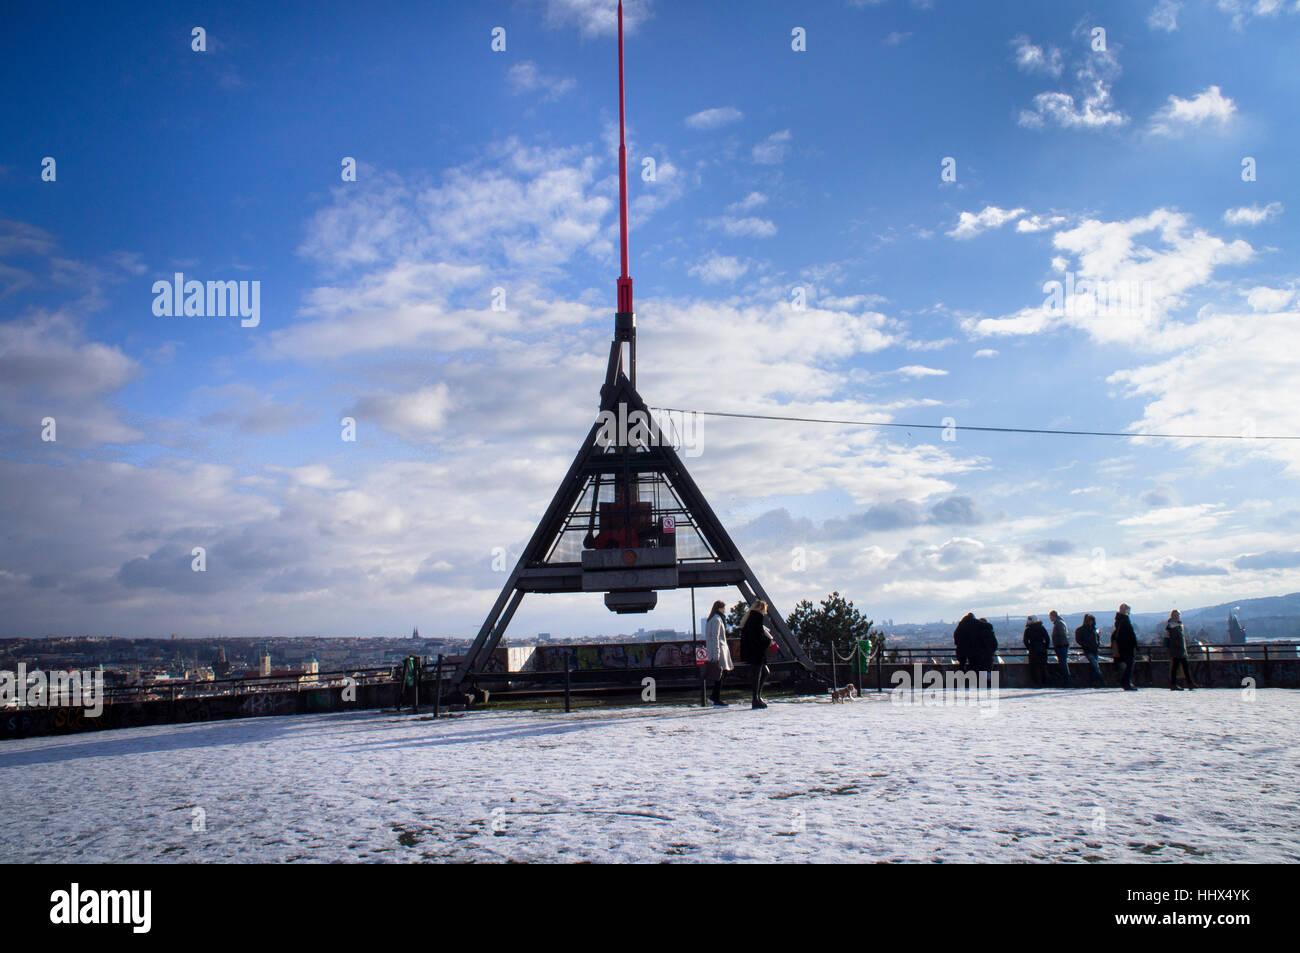 The Prague Metronome in Letna Park - Stock Image